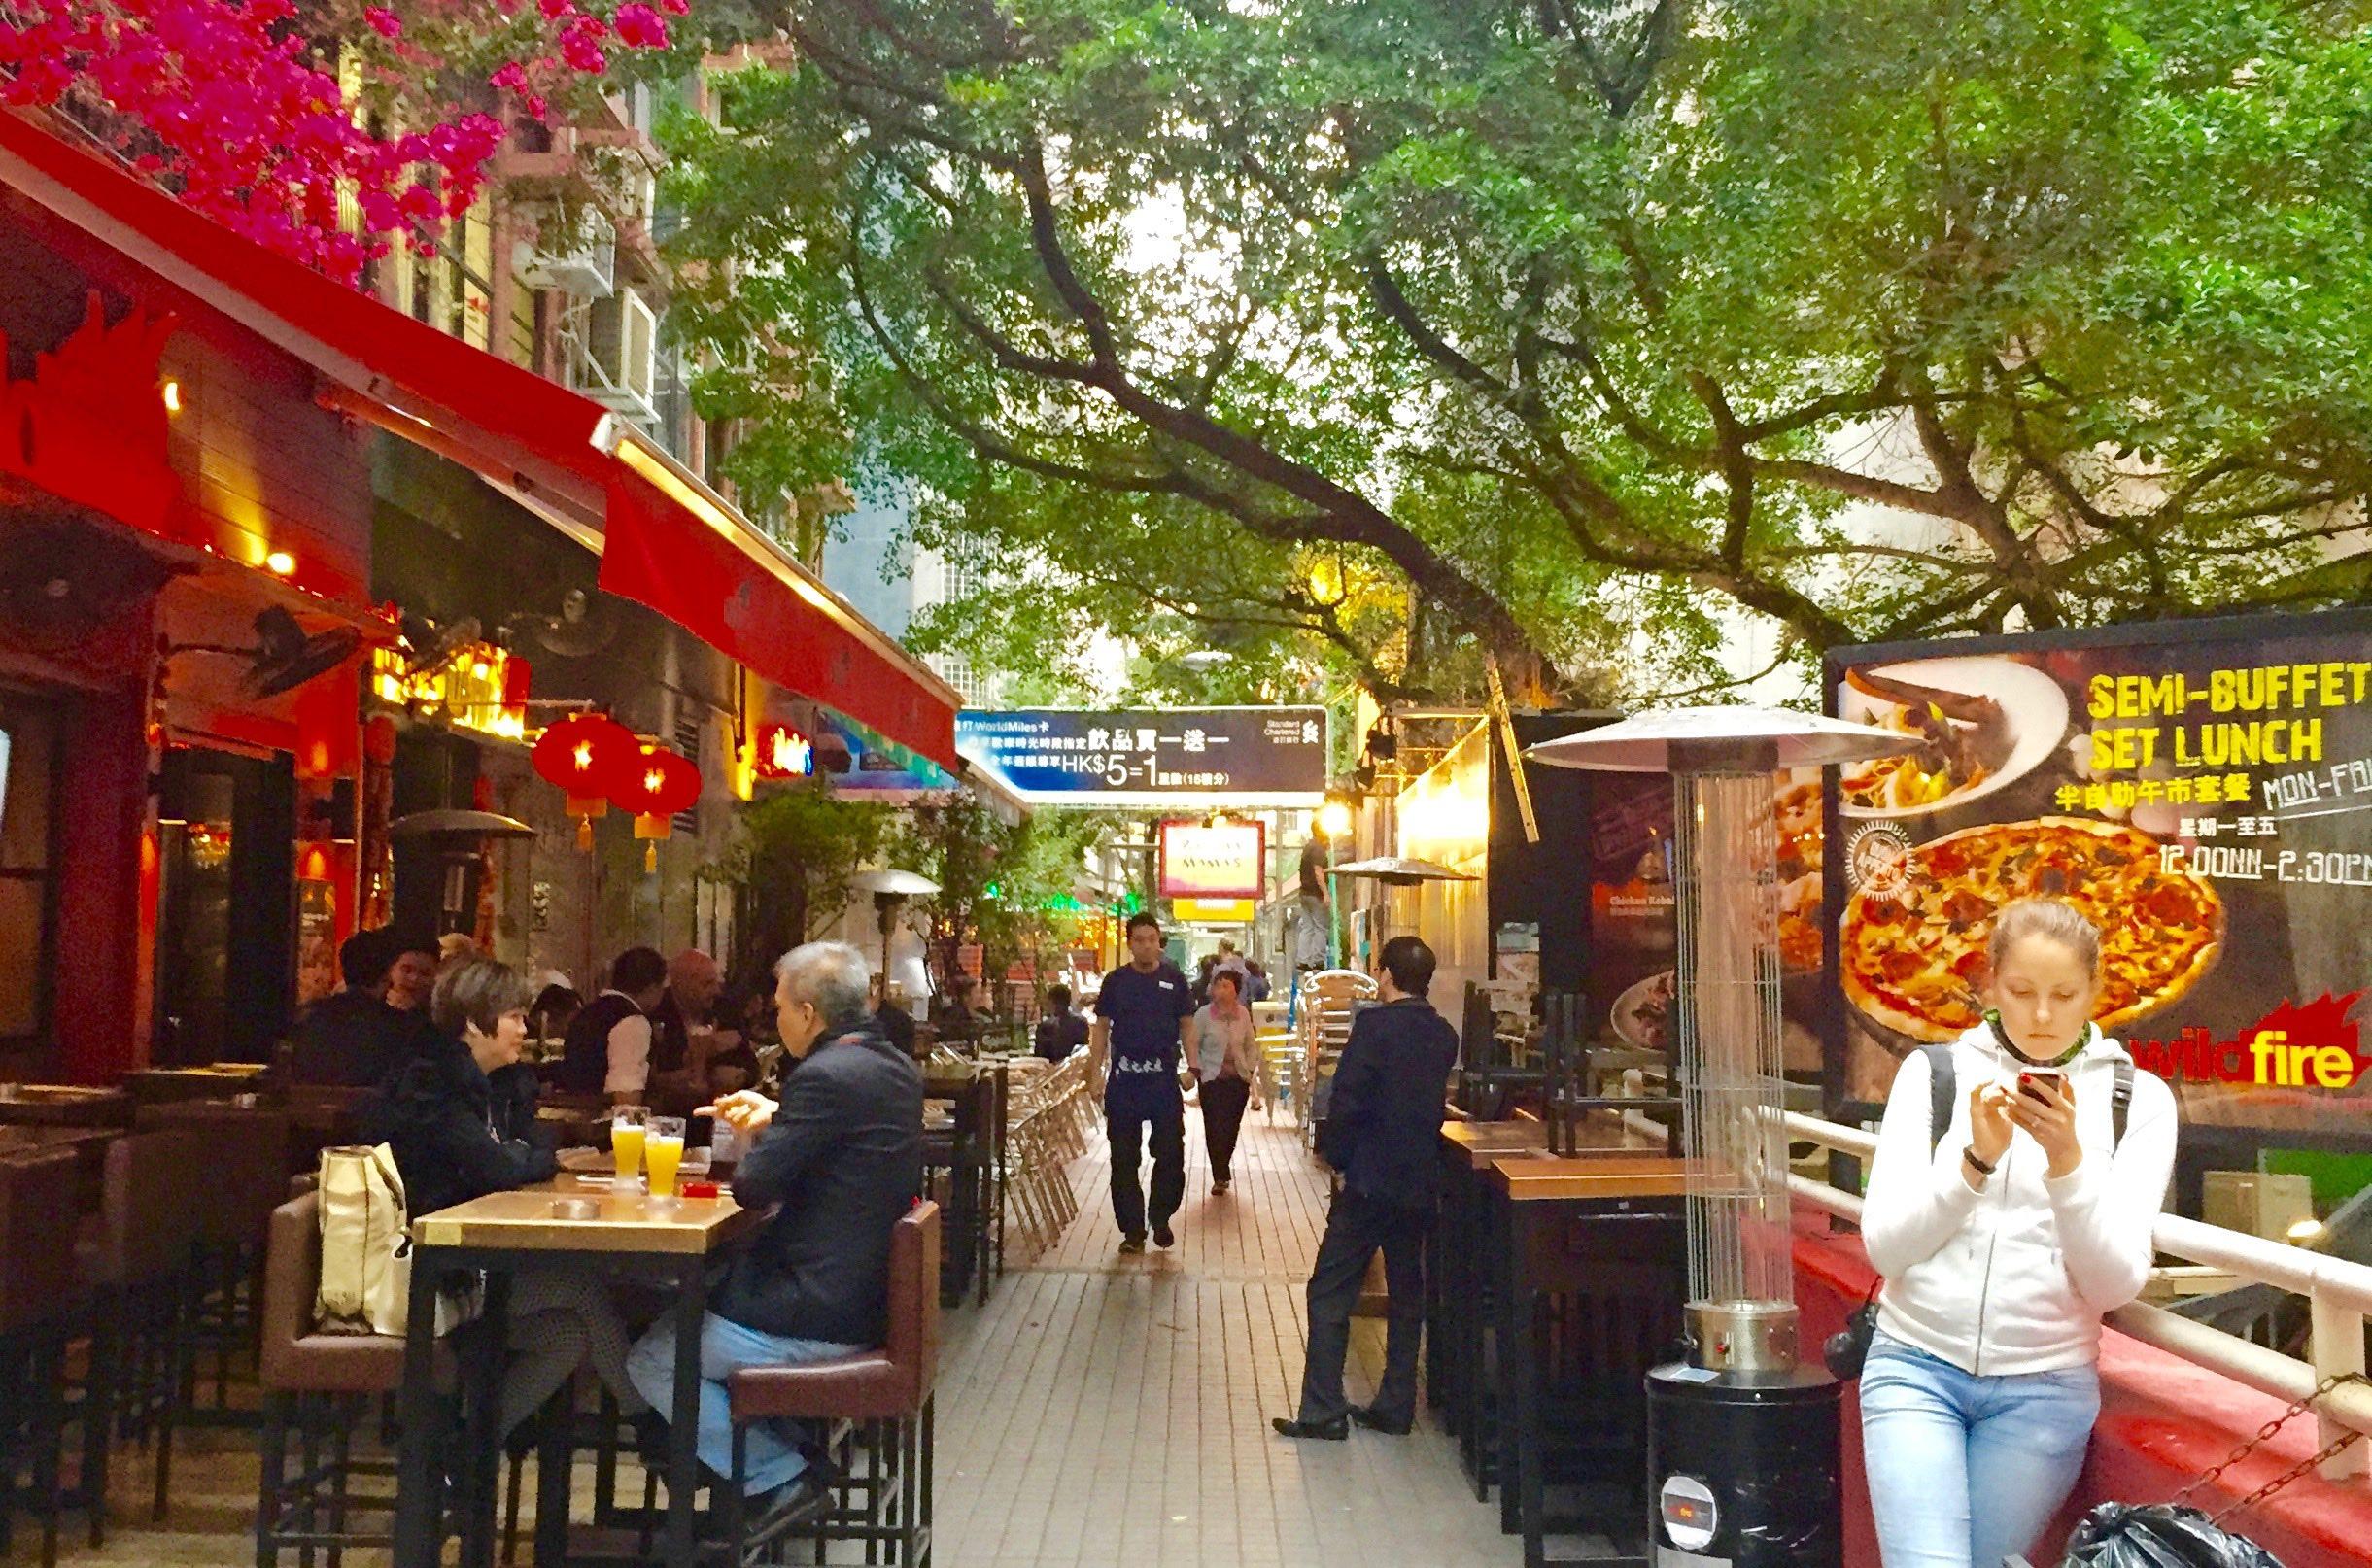 Tsim Sha Tsui Krutsford Terrace - a foodie and bar street around Observatory Road